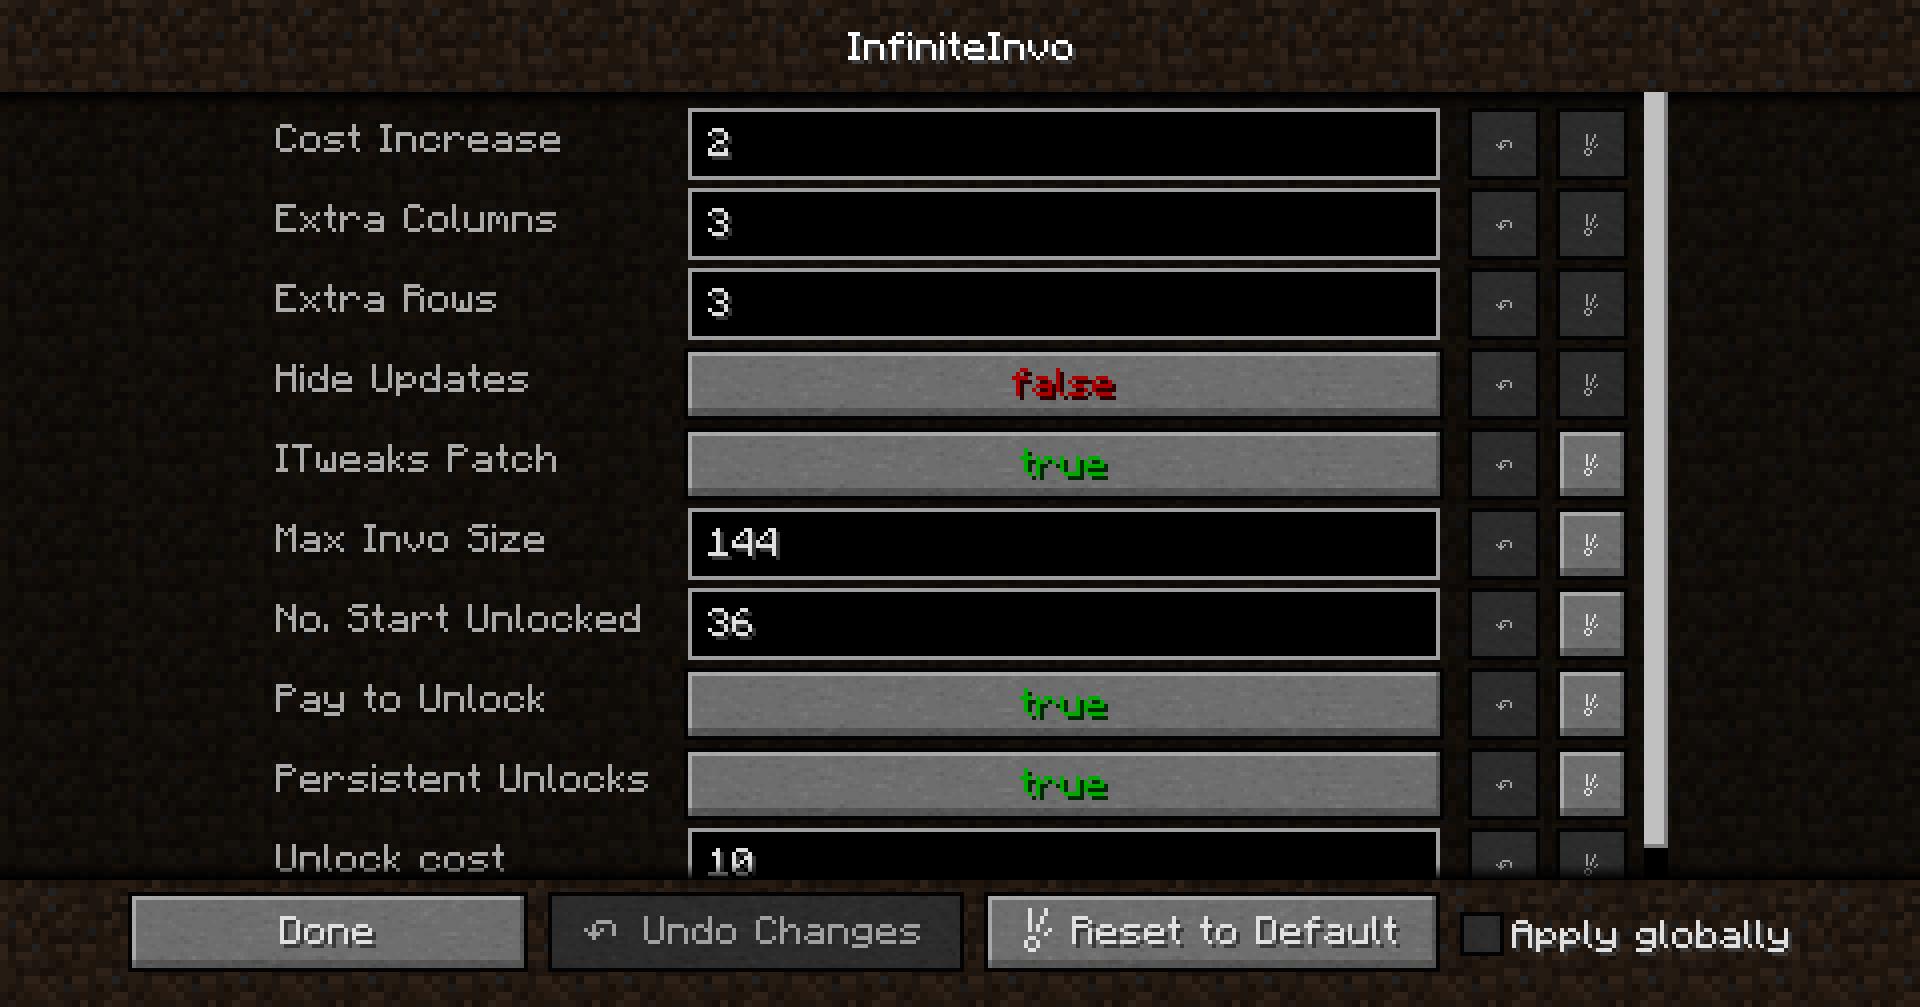 Infiniteinvo-mod-2.png